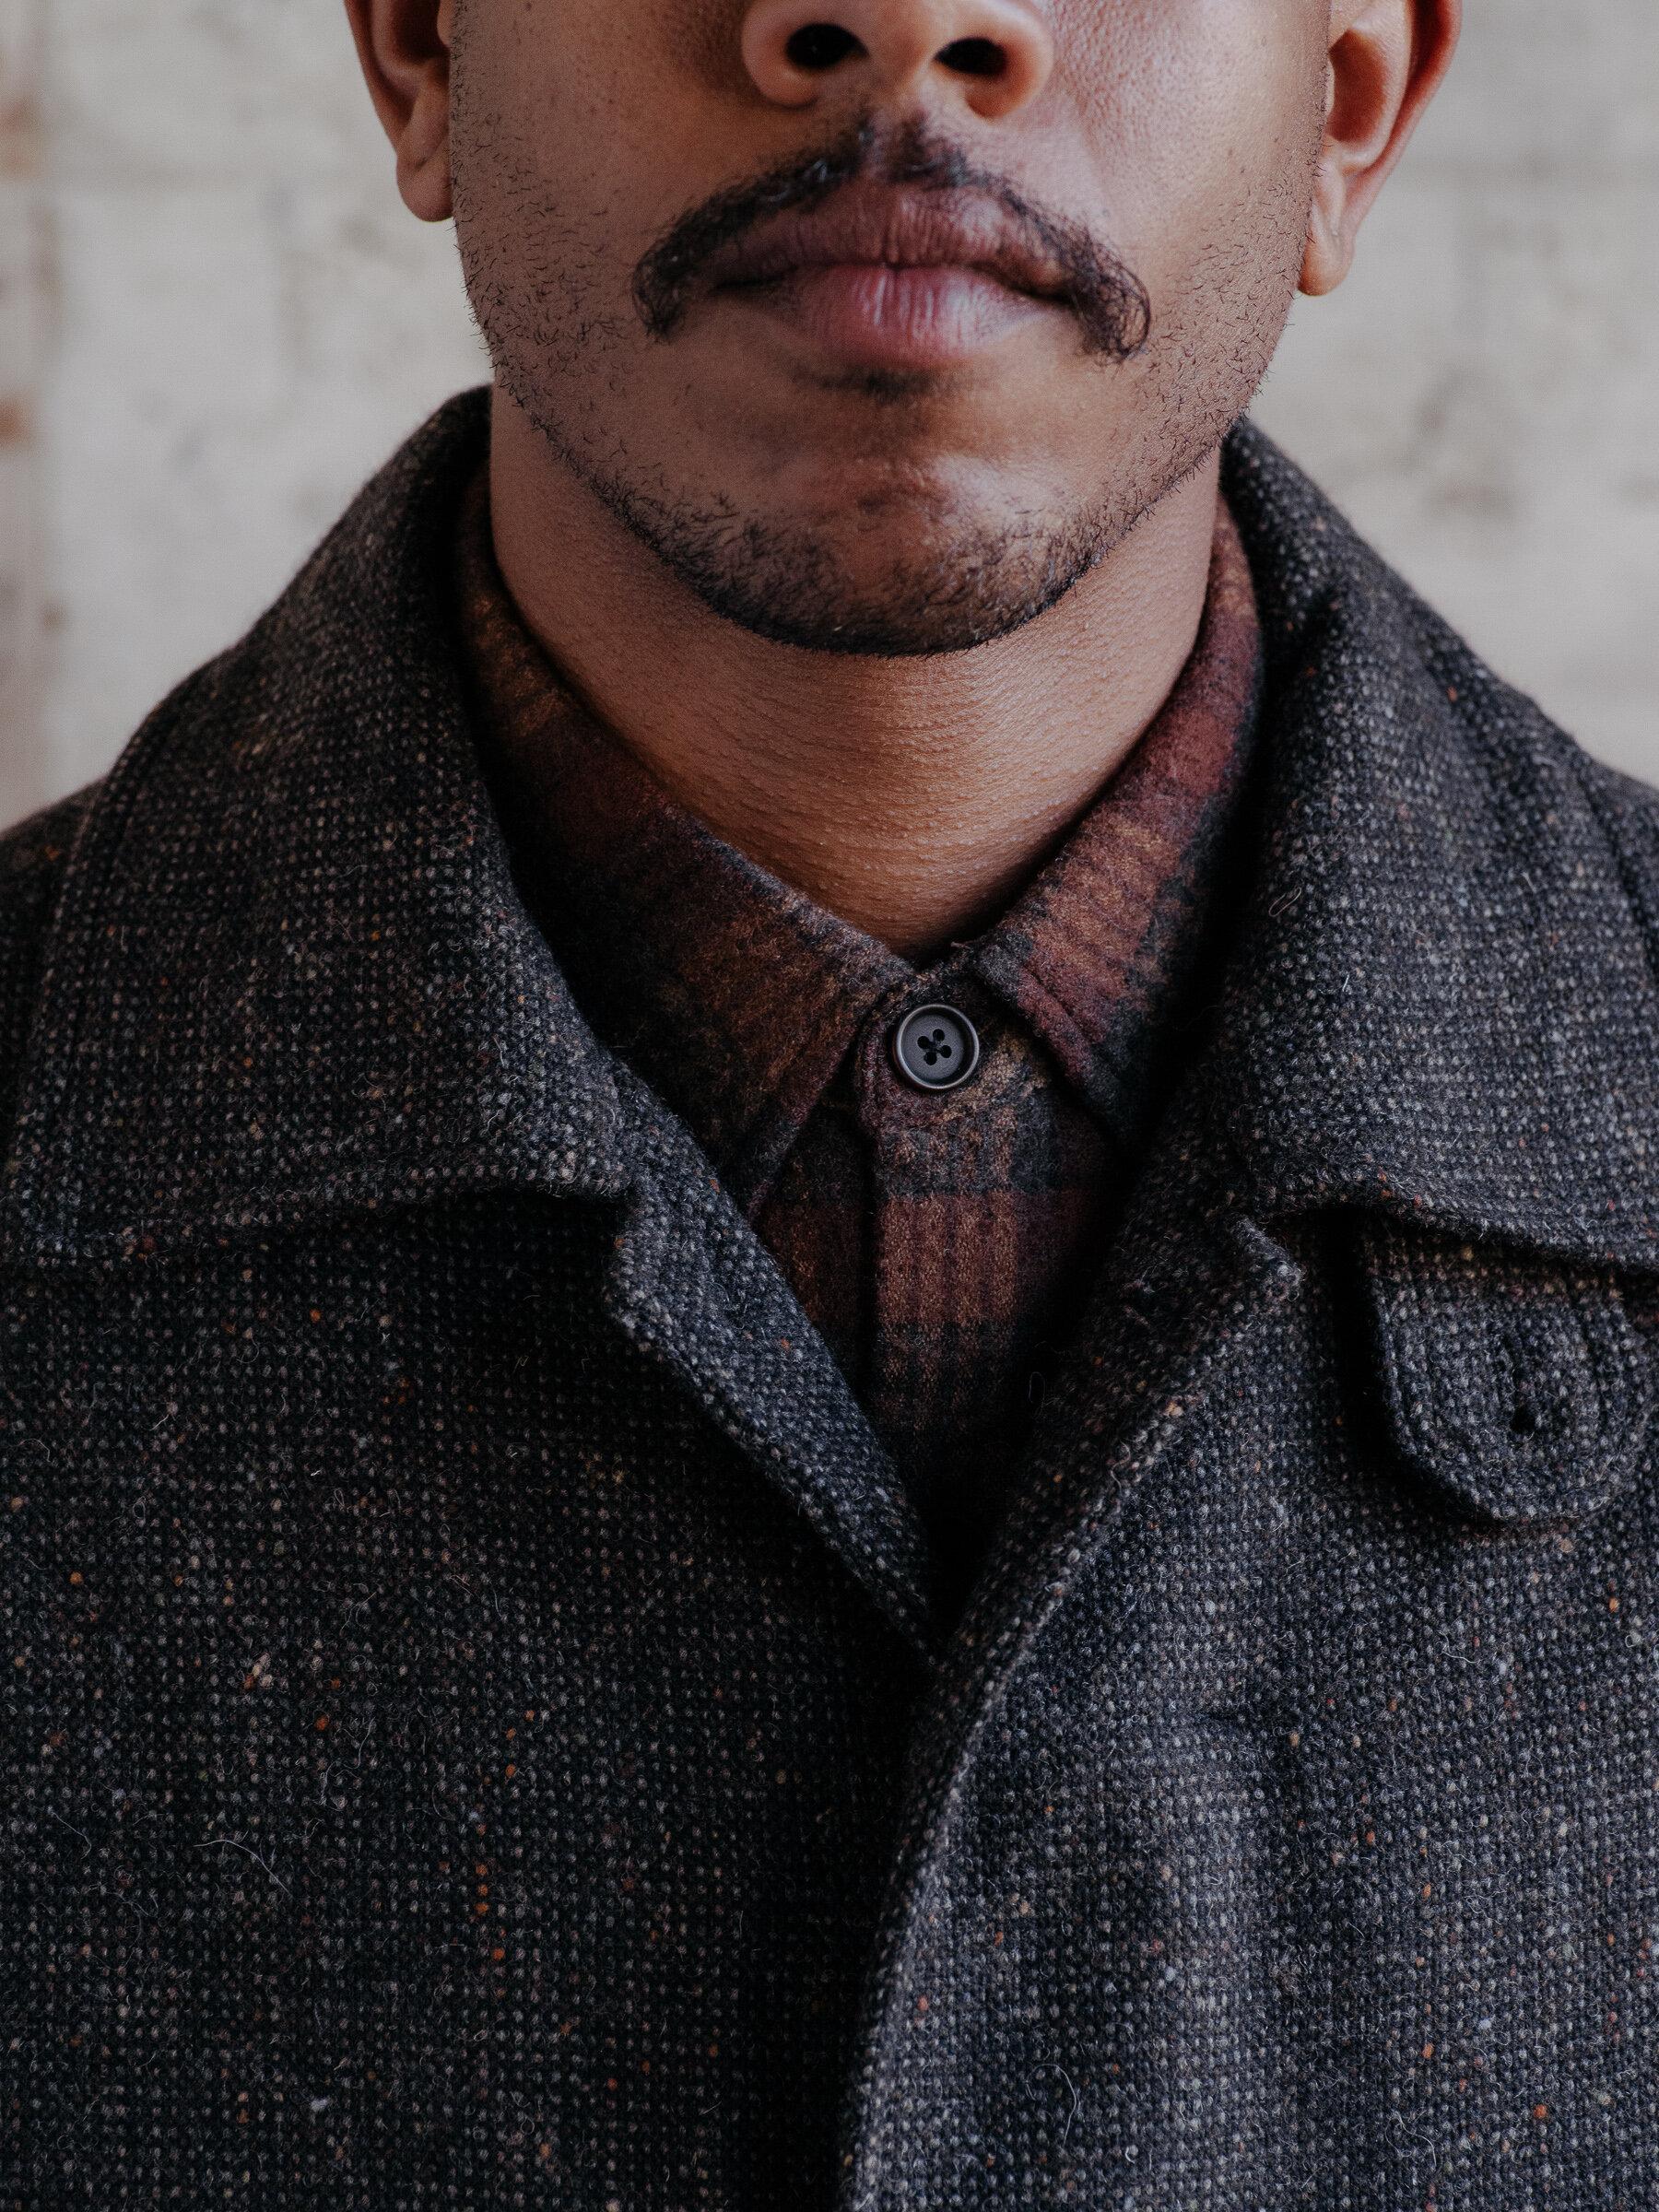 evan-kinori-covered-placket-coat-wool-tweed-woven-in-ireland-molloy-and-sons-9